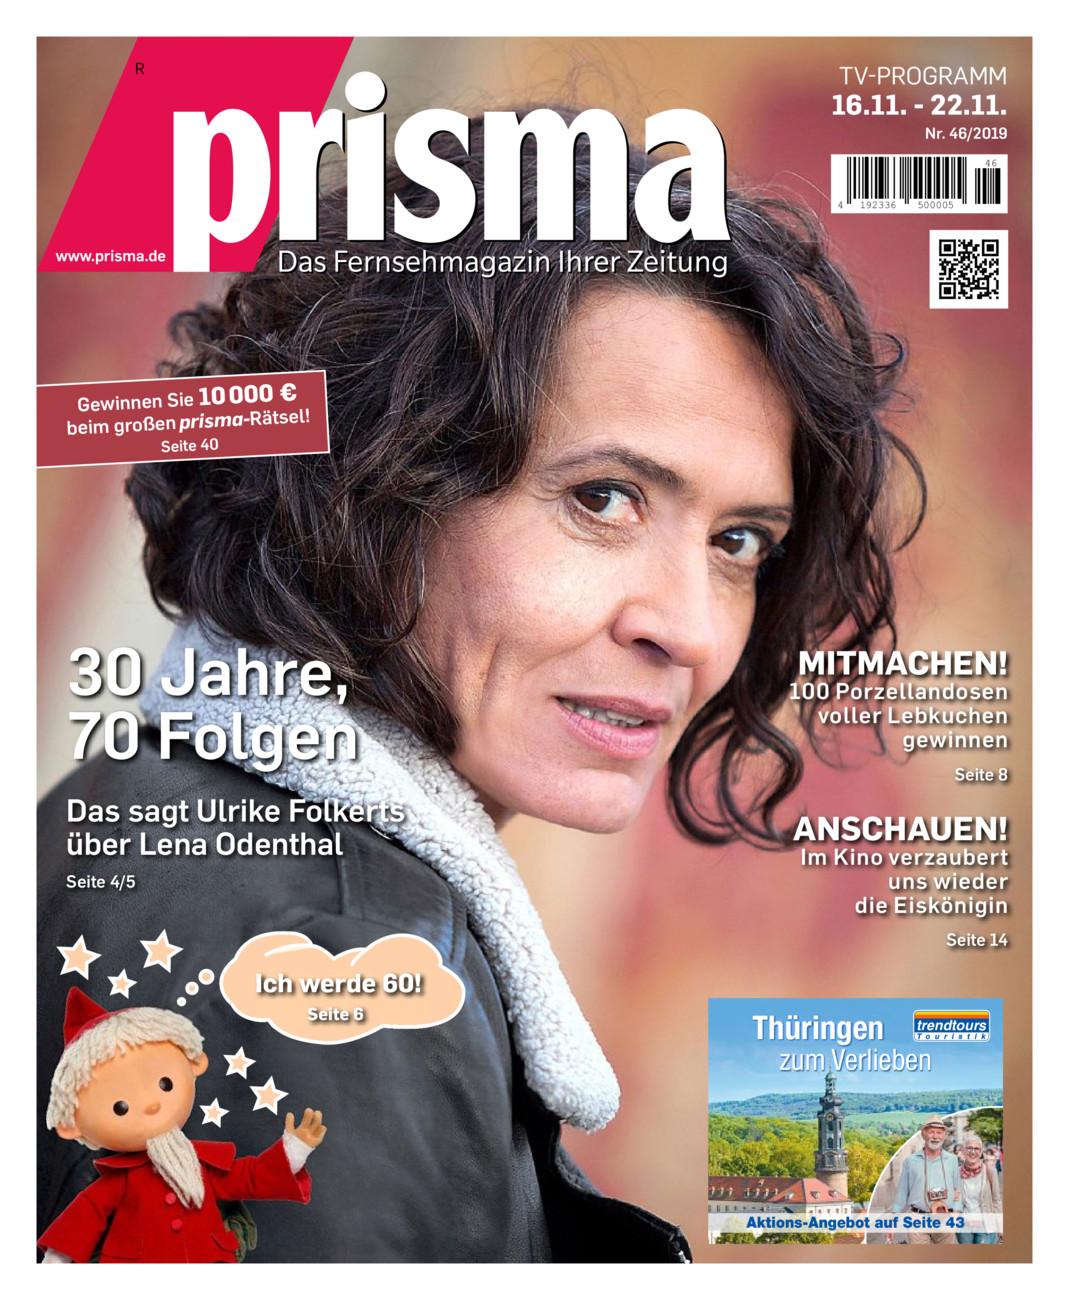 Prisma 16.11. - 22.11.